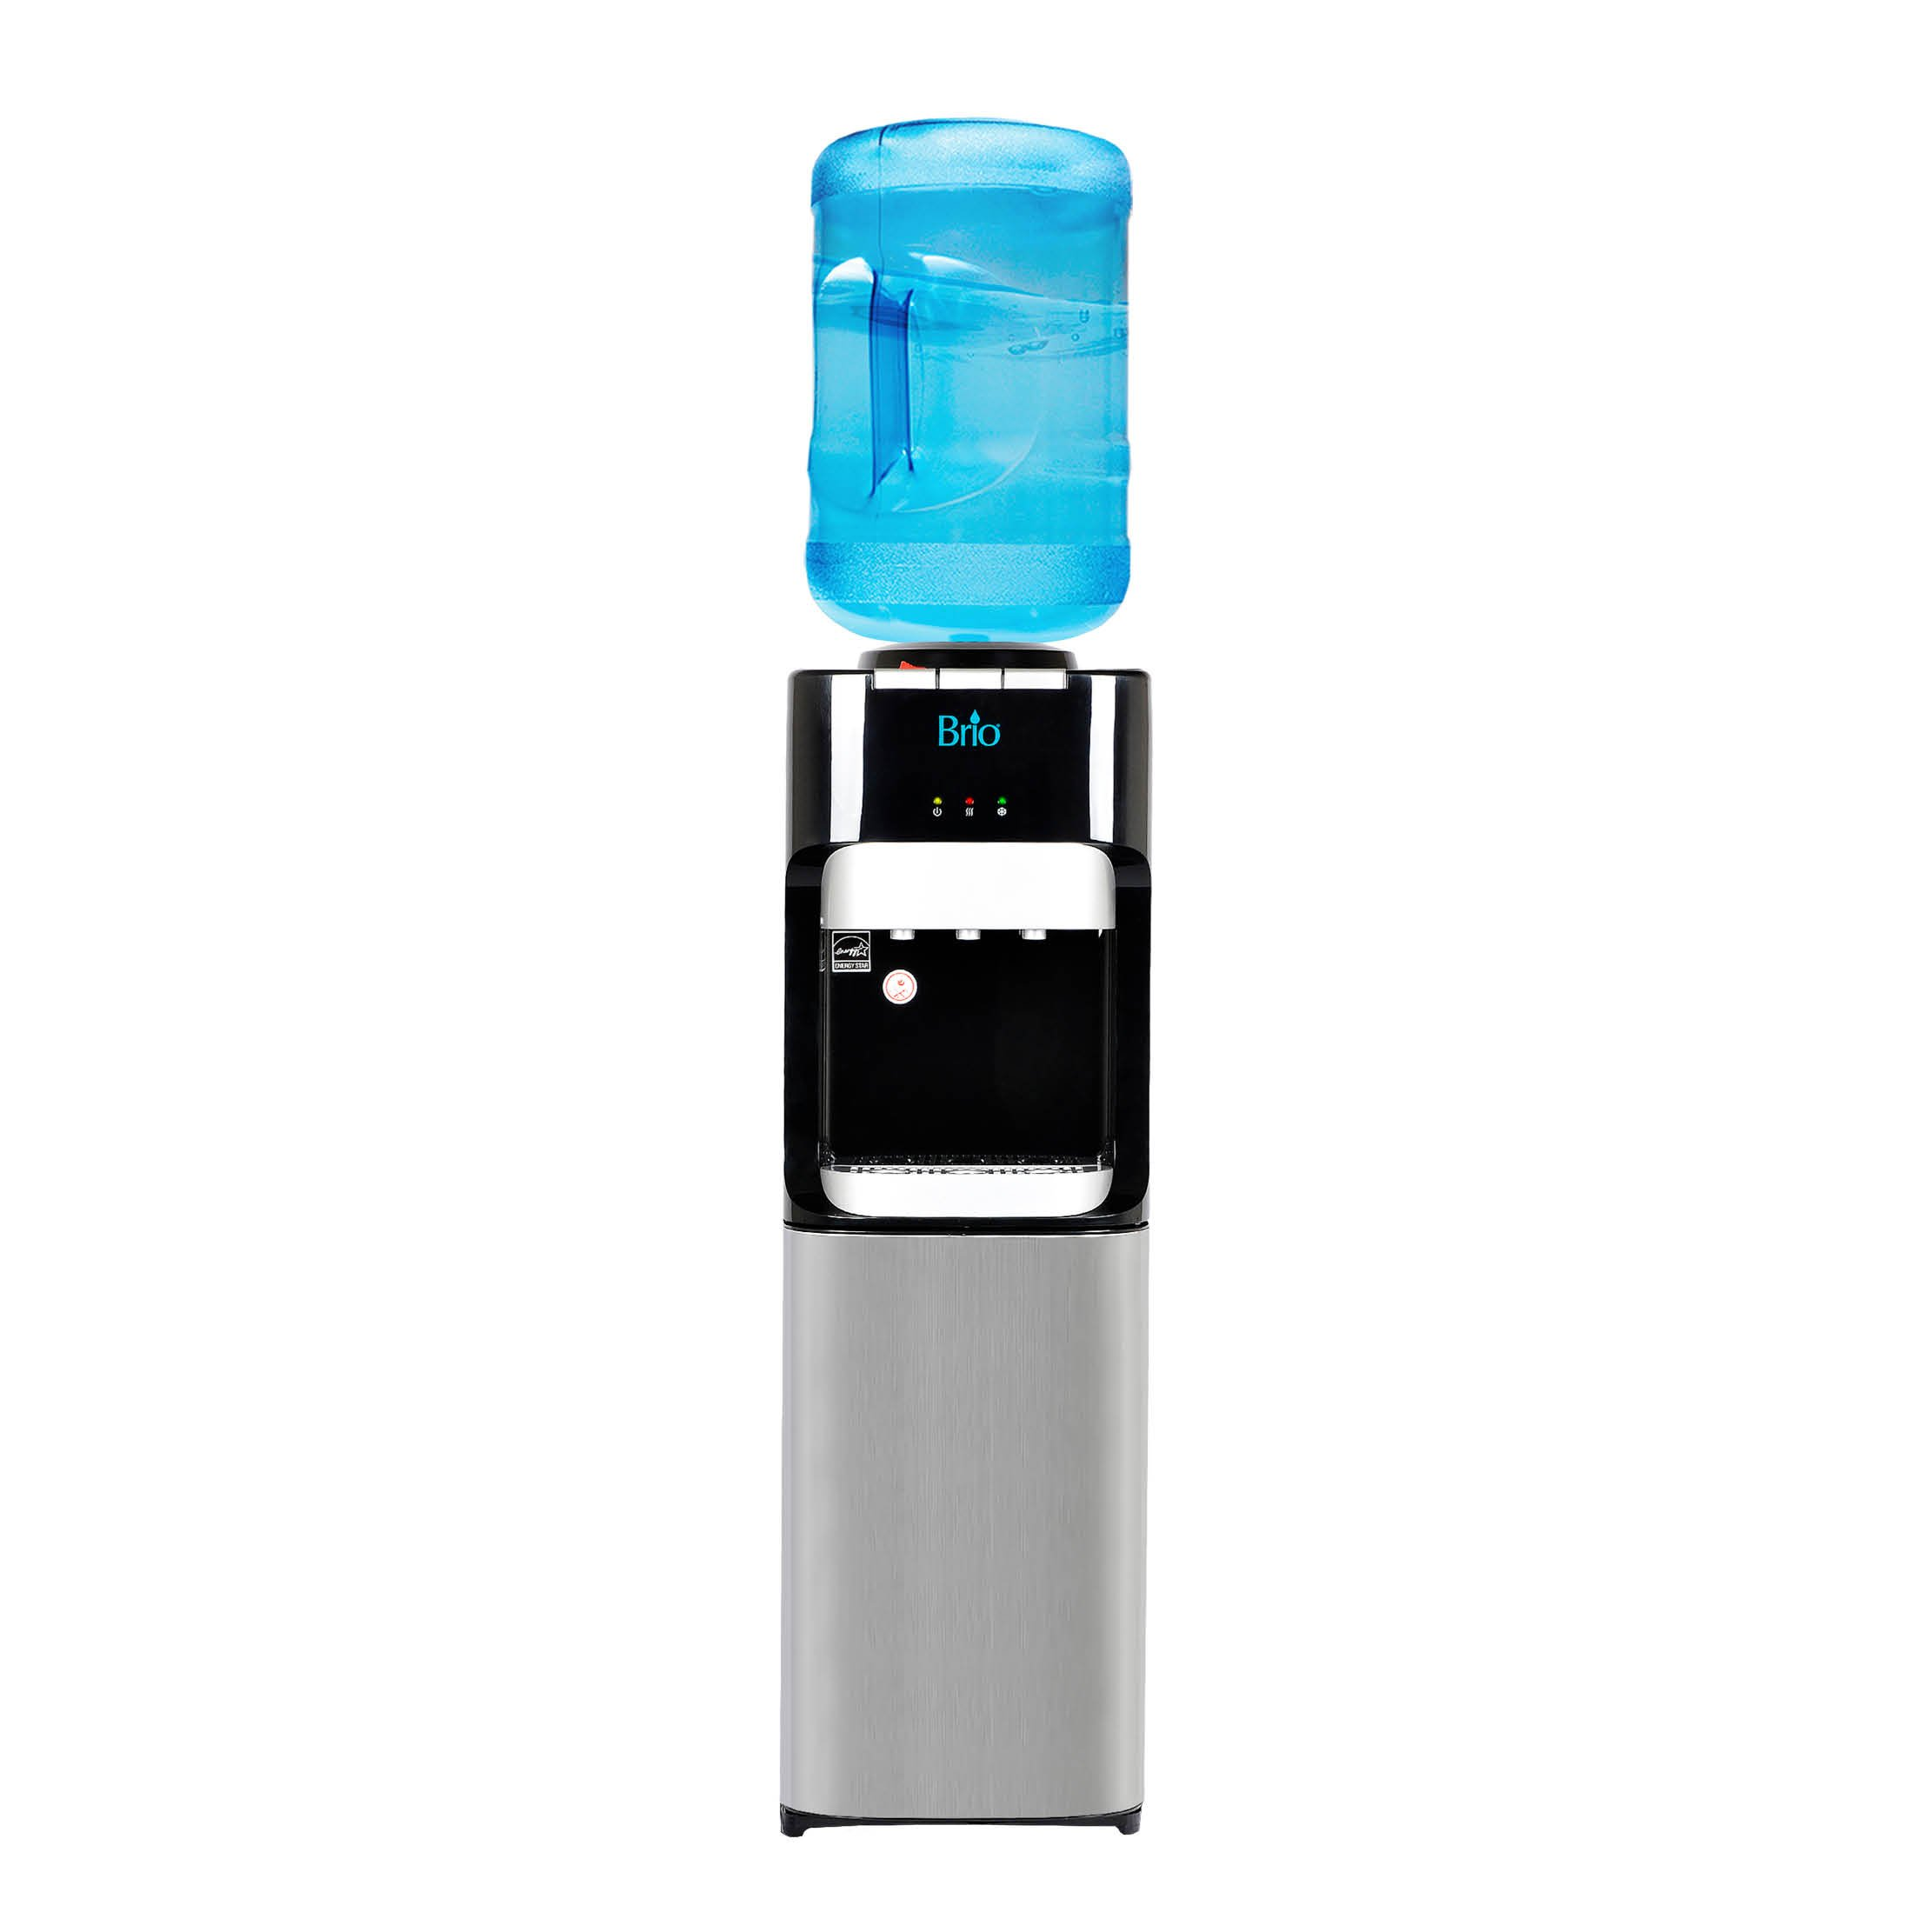 Brio Essential Series Top Load Hot, Cold & Room Water Cooler Dispenser